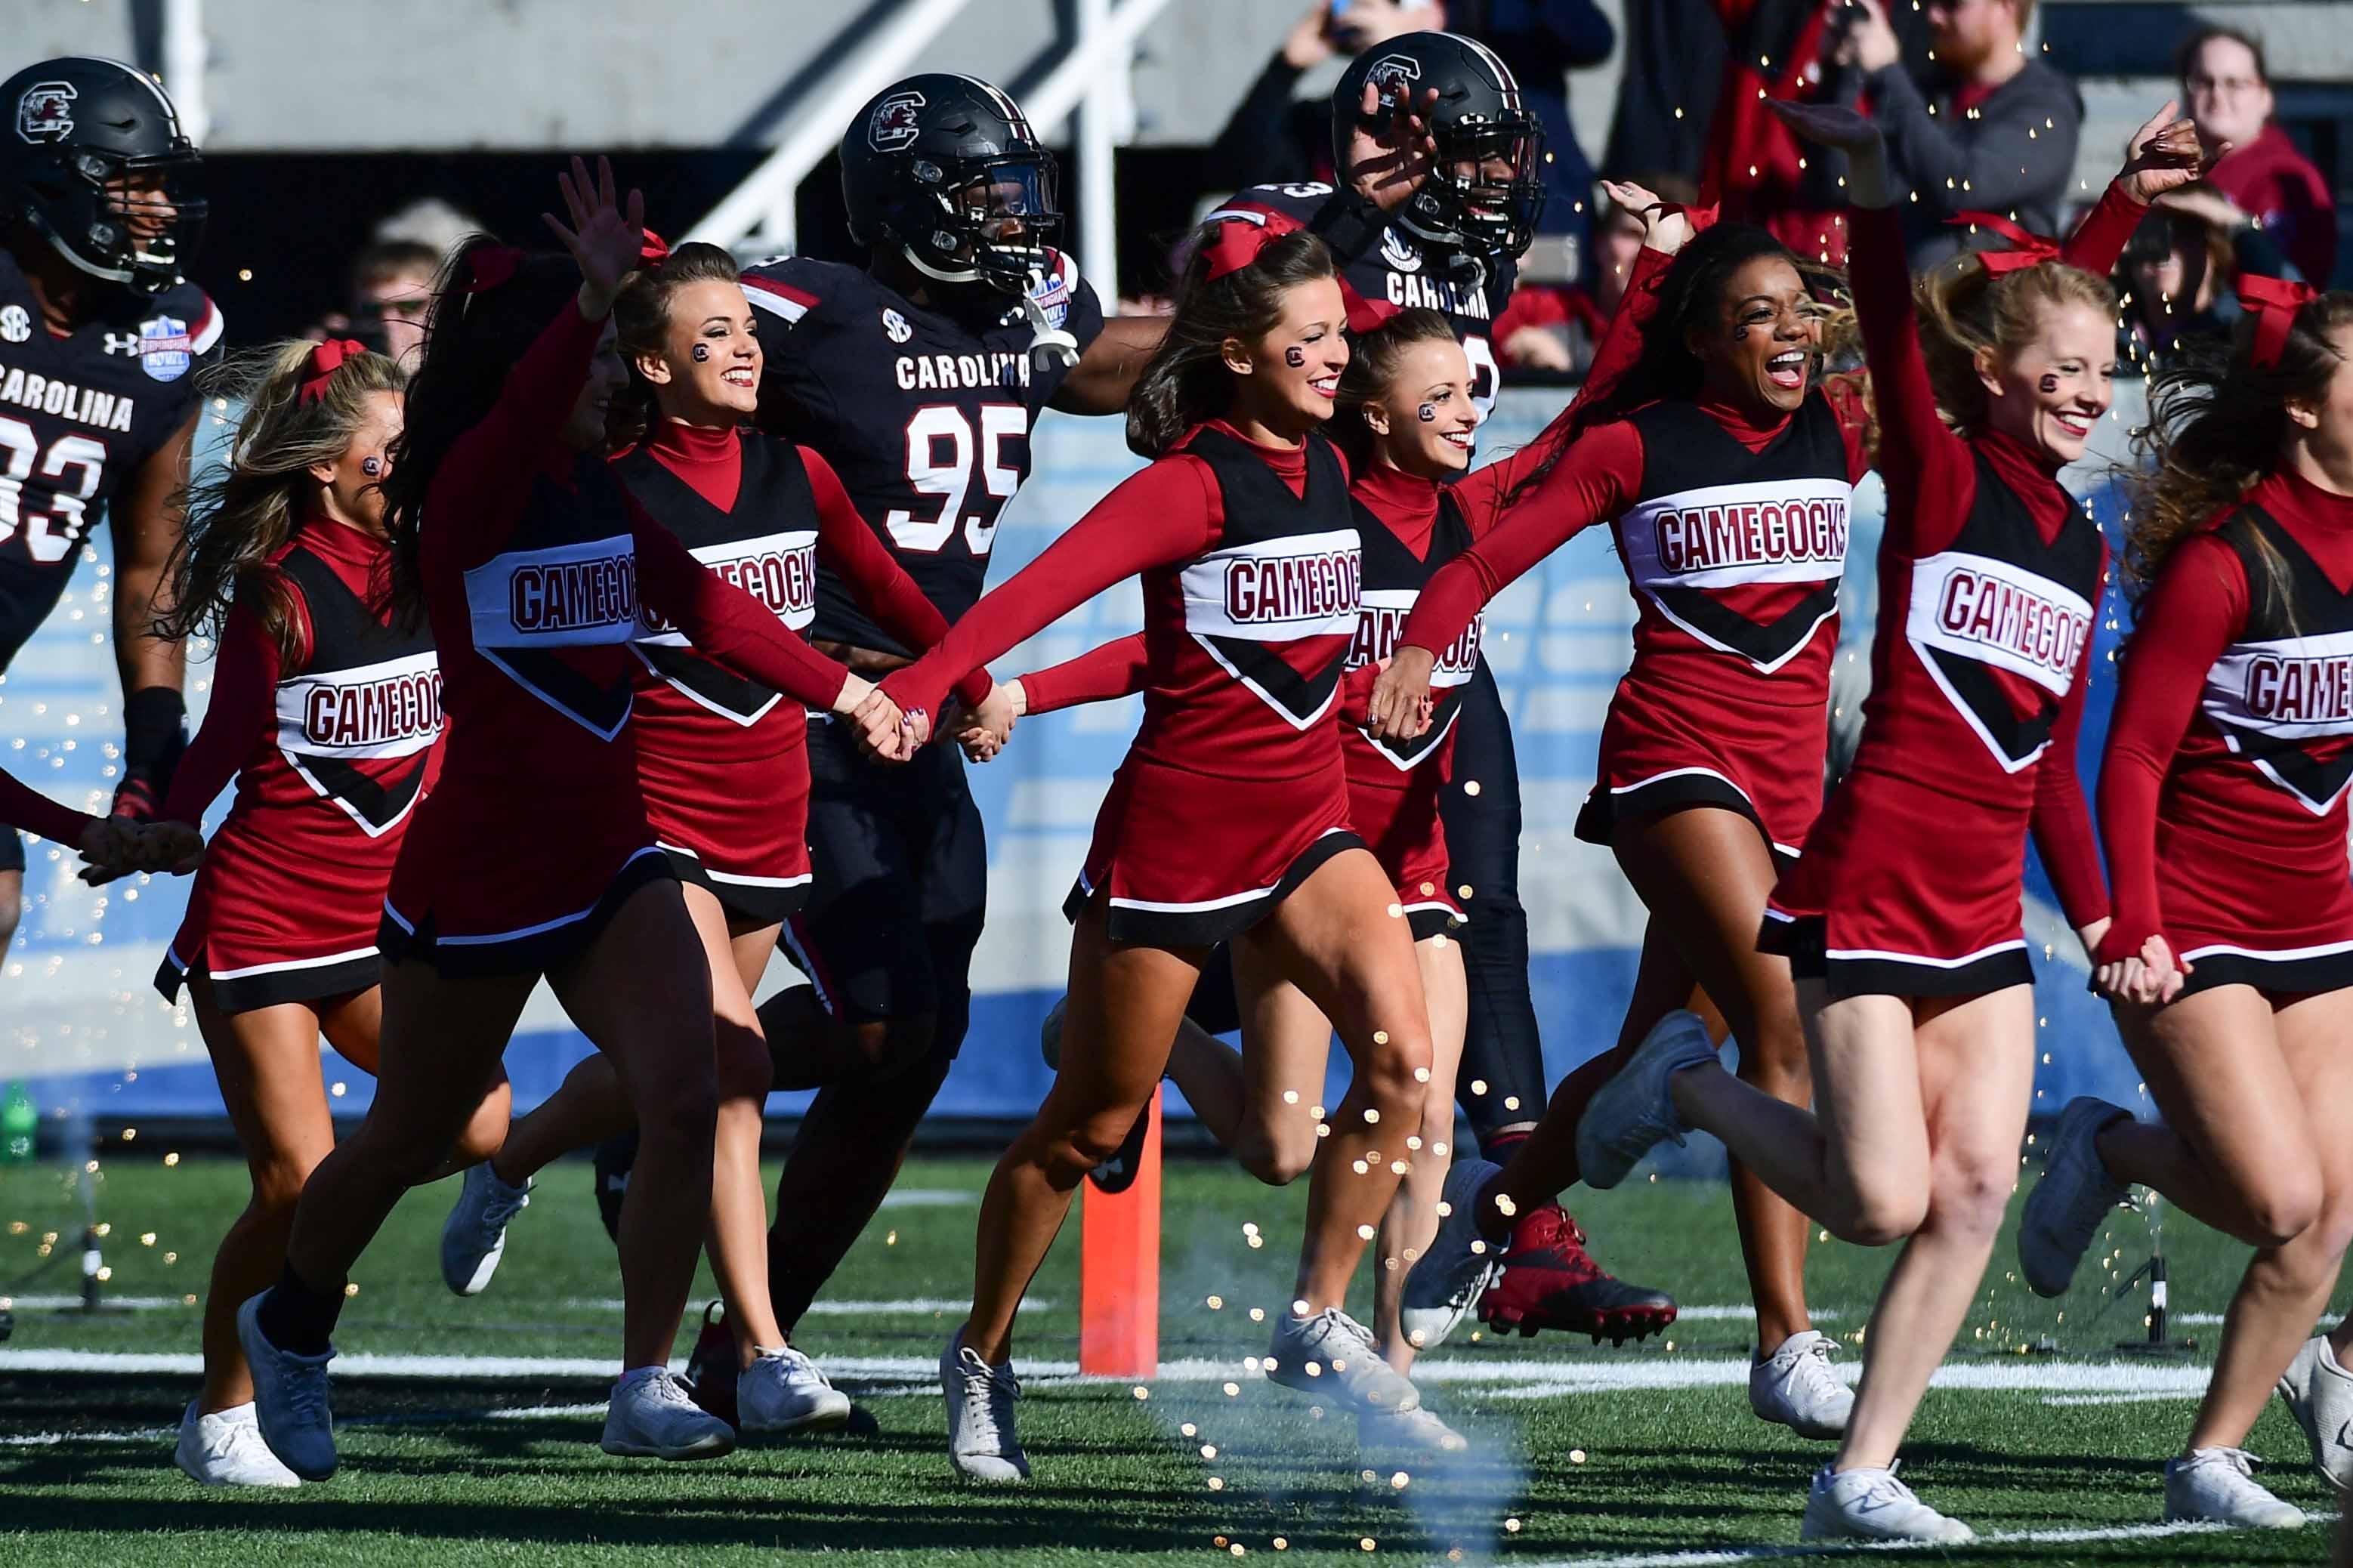 NCAA Football: Birmingham Bowl-South Florida vs South Carolina